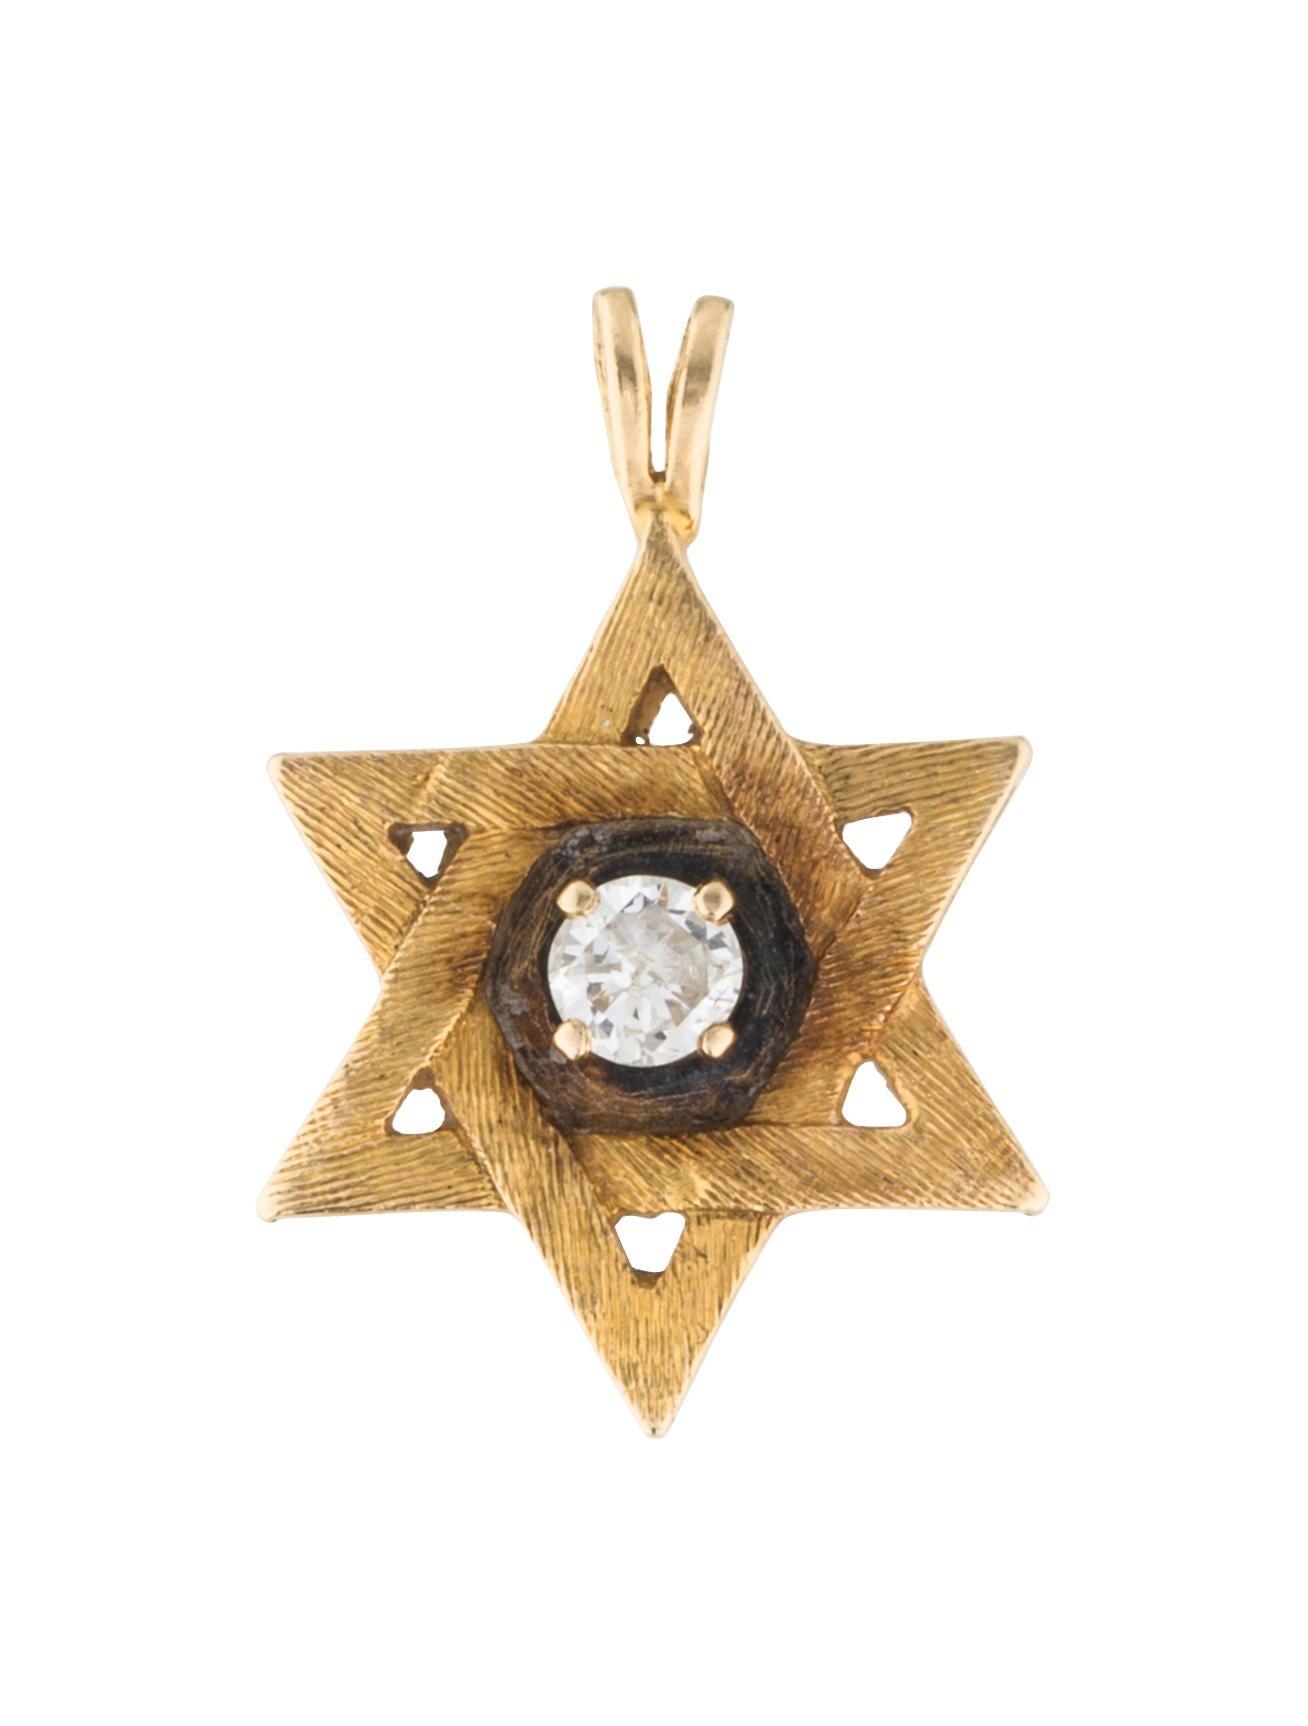 14k diamond star of david pendant necklaces penda22953 for Star hallmark on jewelry